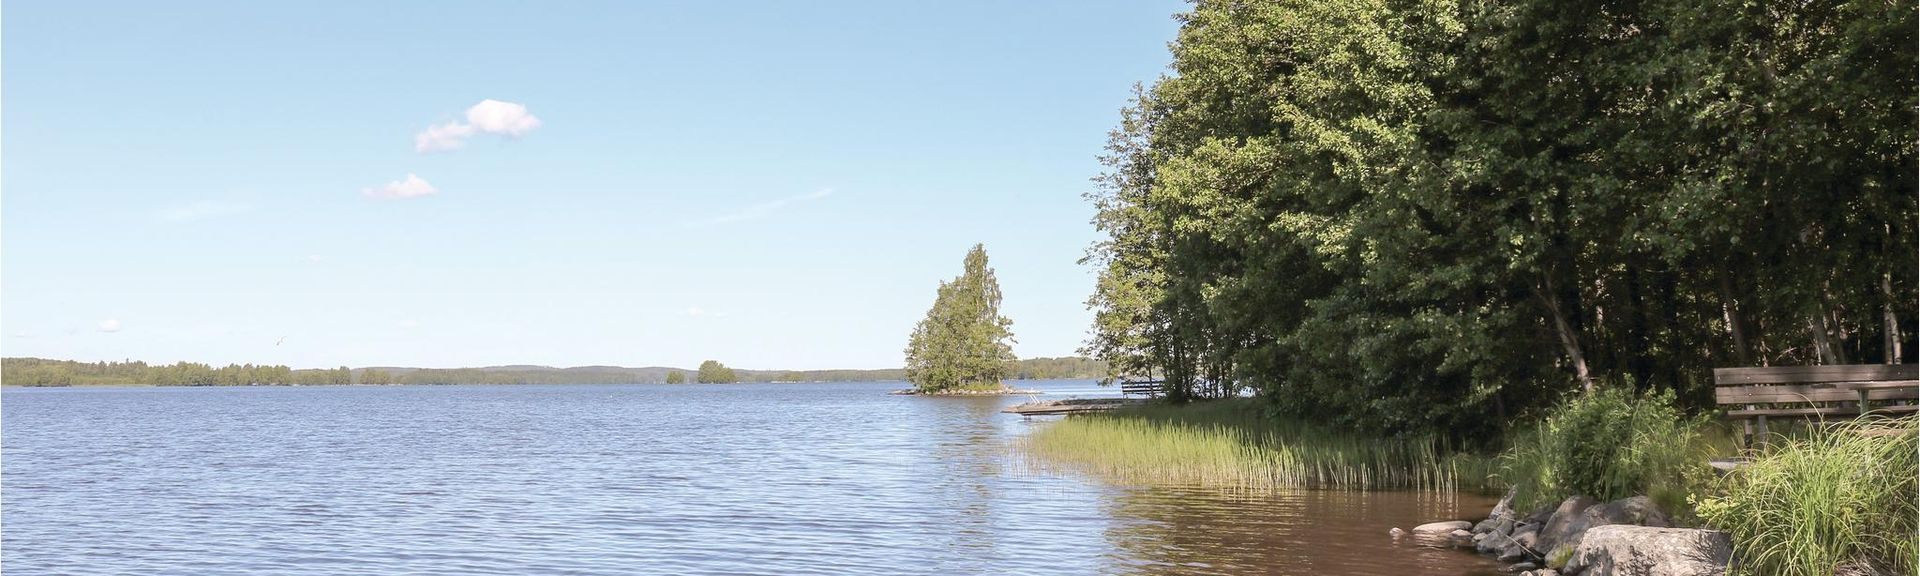 Tampere sub-region, Pirkanmaa, Finlande